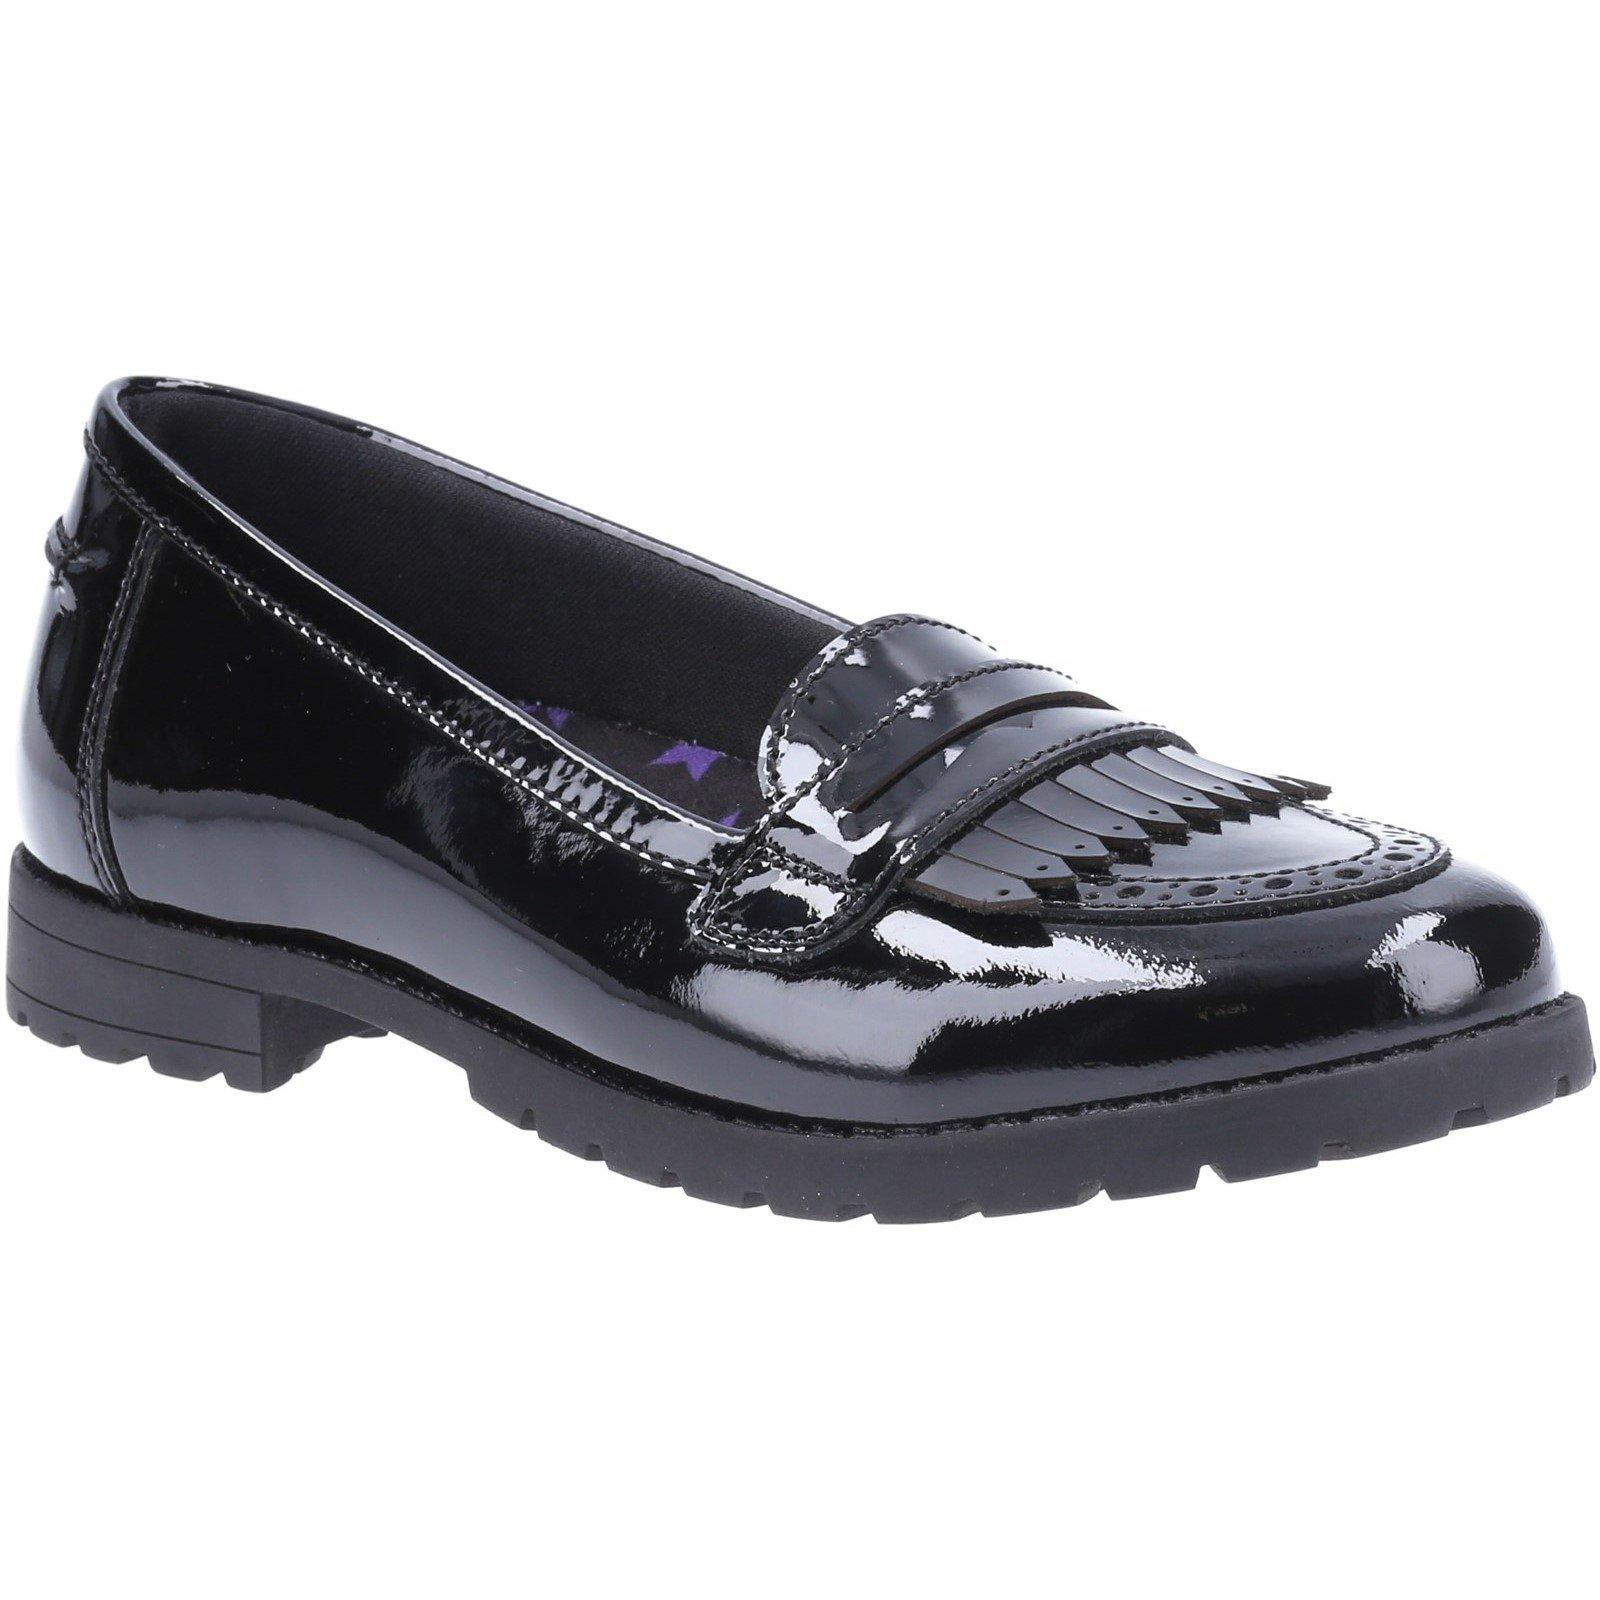 Hush Puppies Kid's Emer Junior School Shoe Patent Black 32595 - Patent Black 12